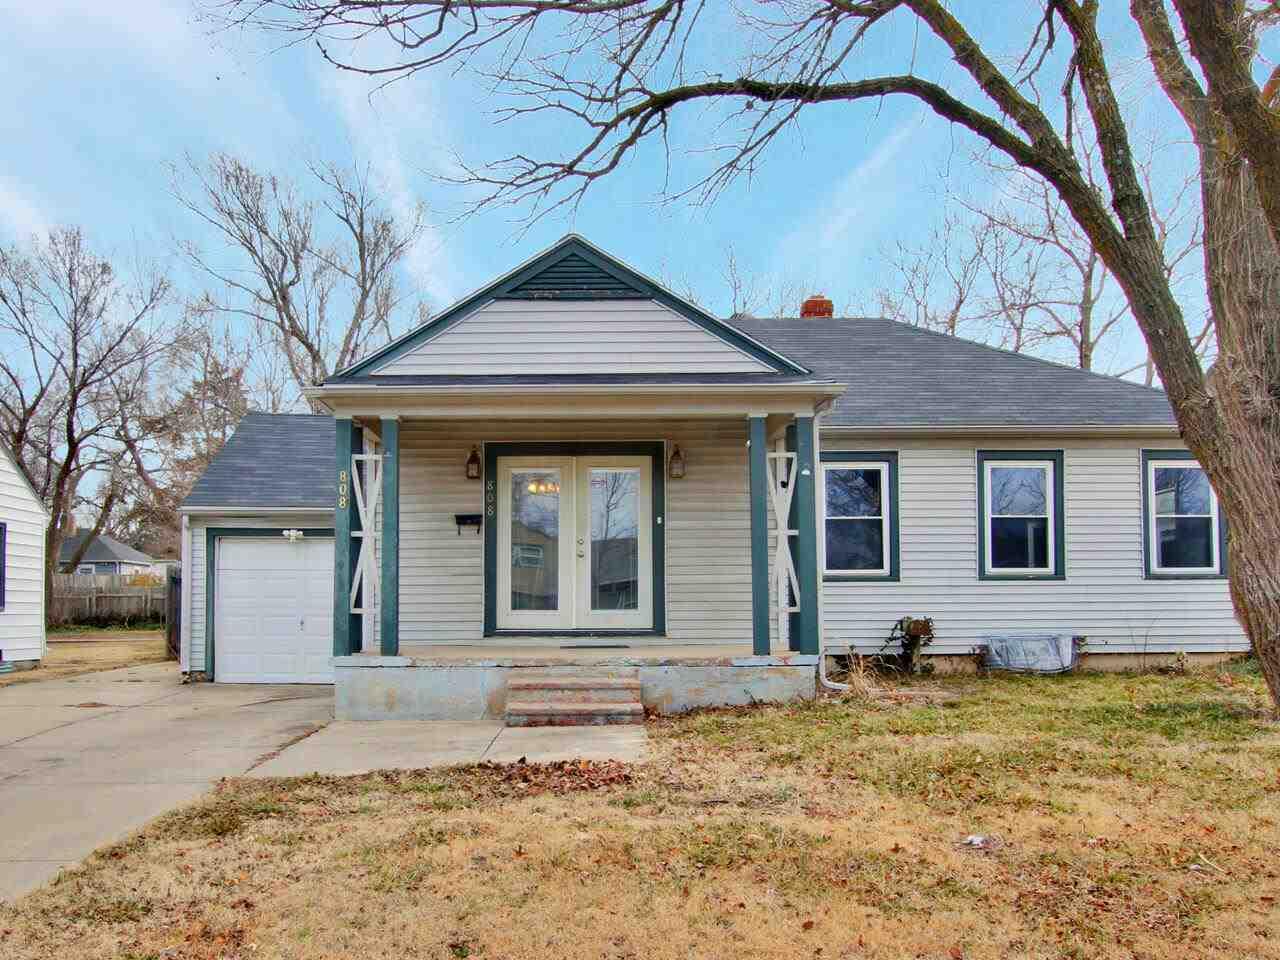 808 N Old Manor Rd, Wichita, KS, 67208